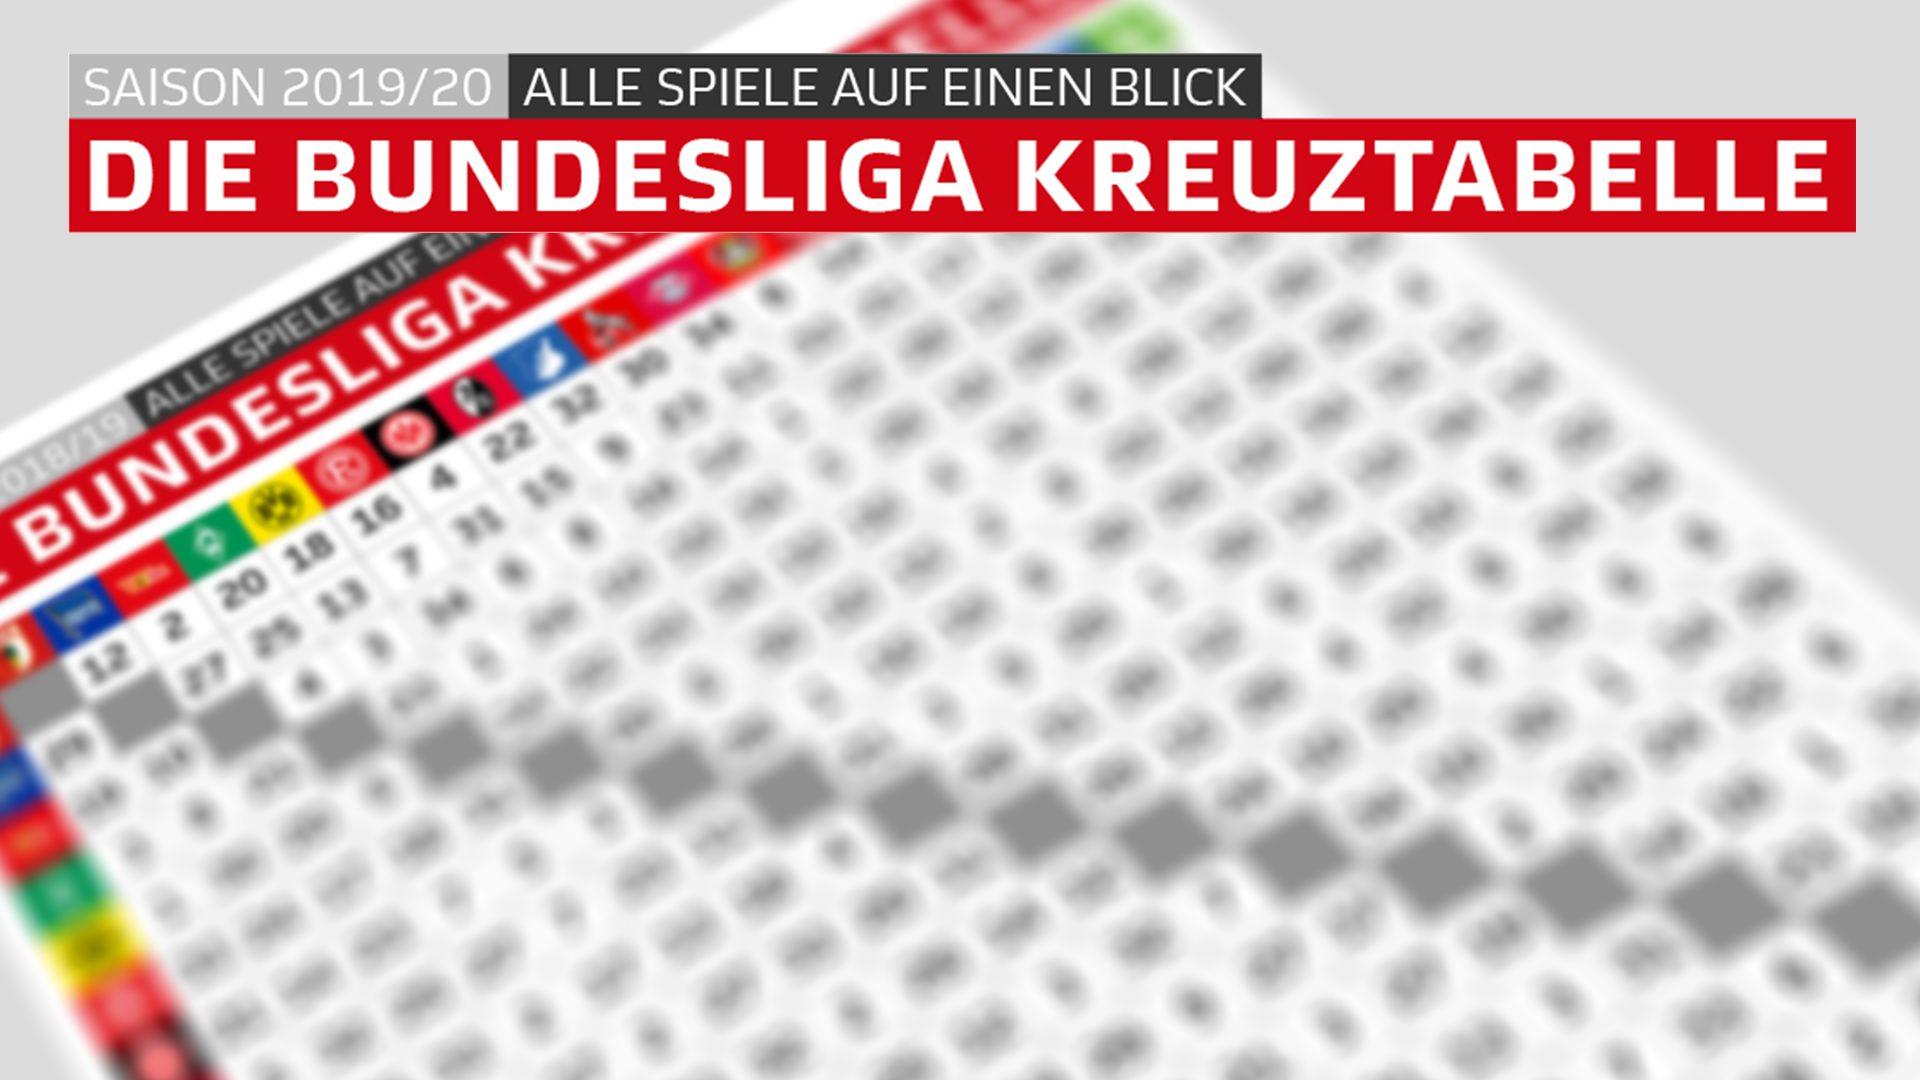 Bundesliga Kreuztabelle Alle Spiele Der Saison 2019 20